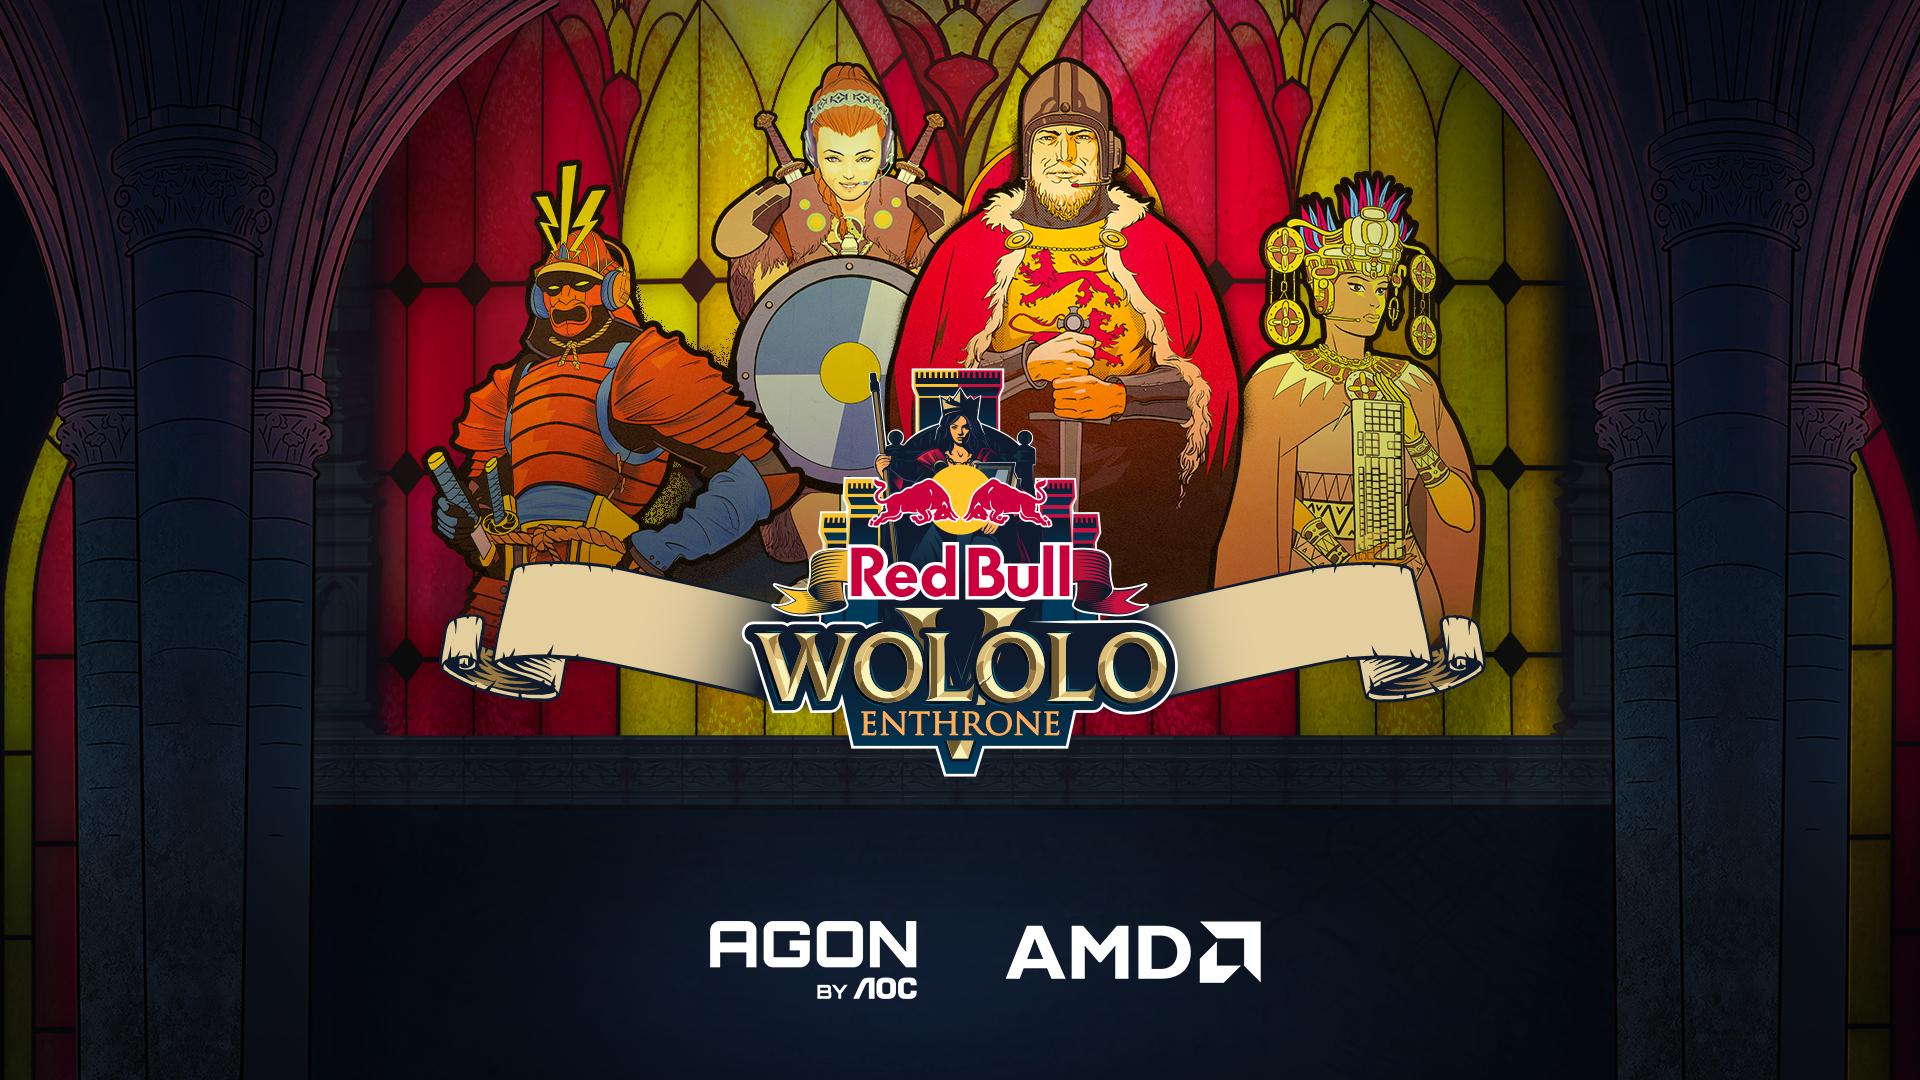 Red Bull WololoV_social-16x9_BOTH LOGOS_NO SCROLL TEXT.png